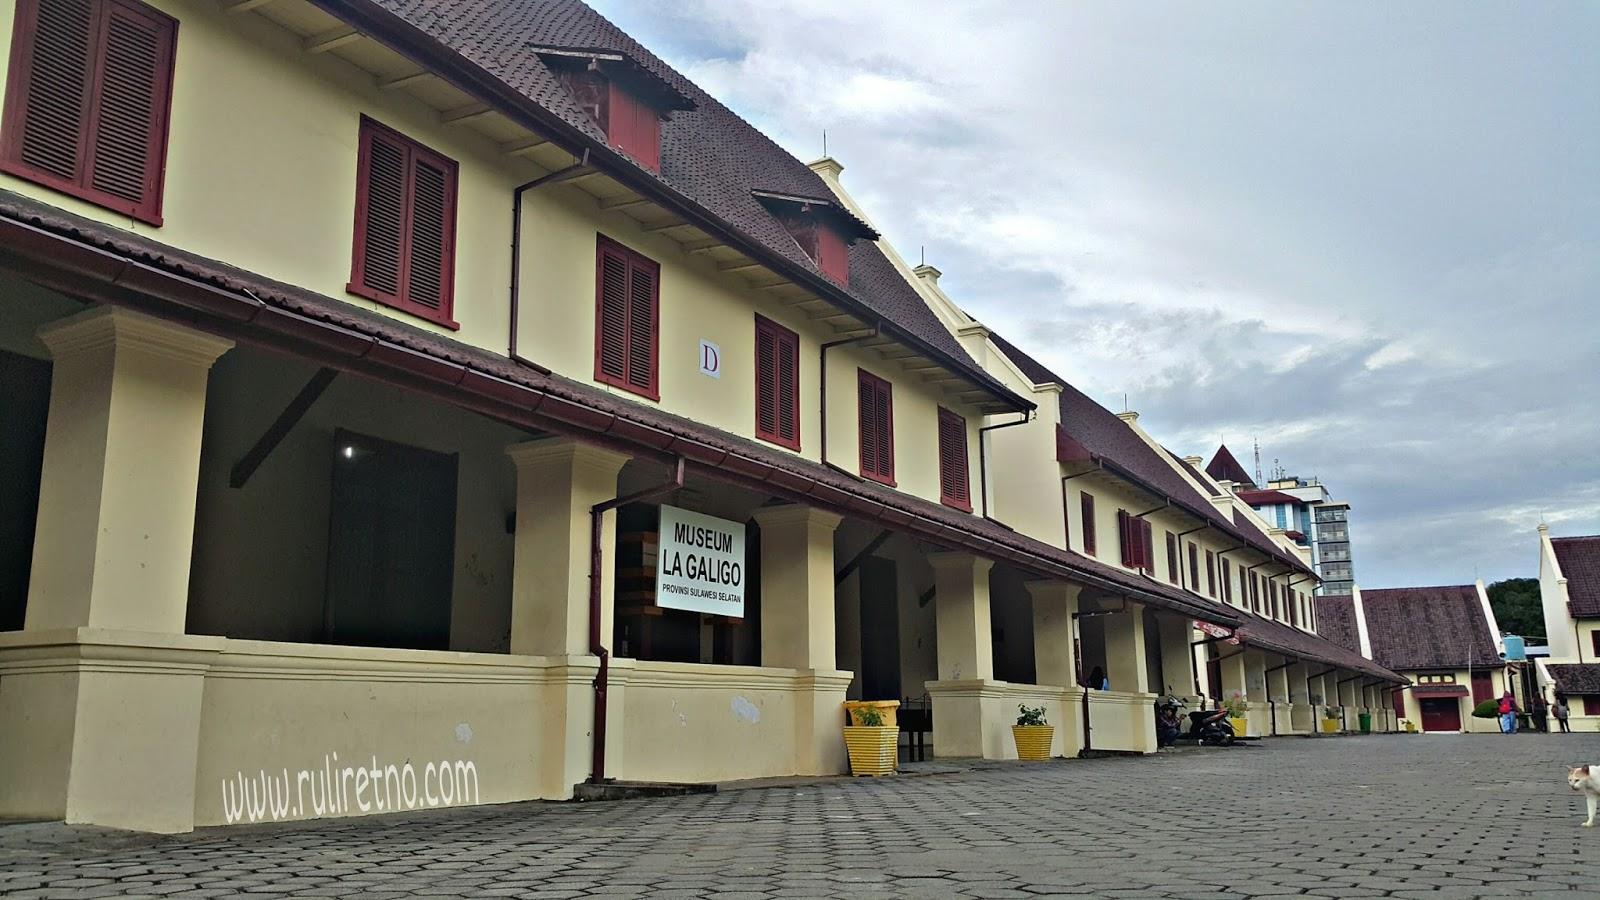 Ruliretno Tentang Museum La Galigo Fort Rotterdam Makassar Bukan Secara